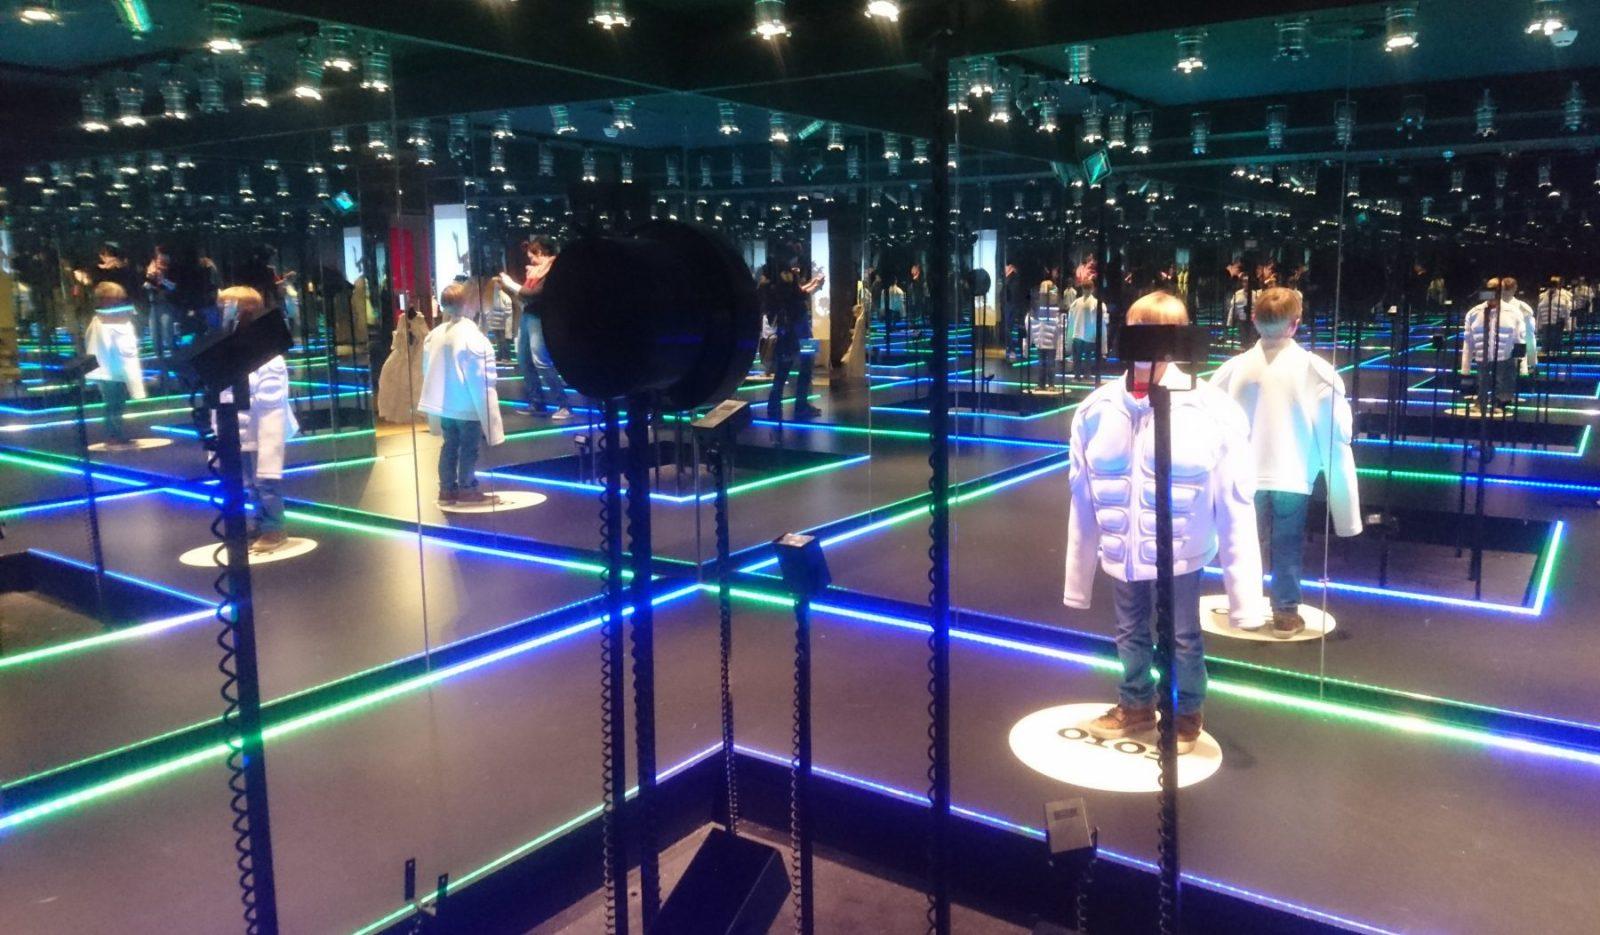 Gemeentemuseum Wonderkamers Catwalk